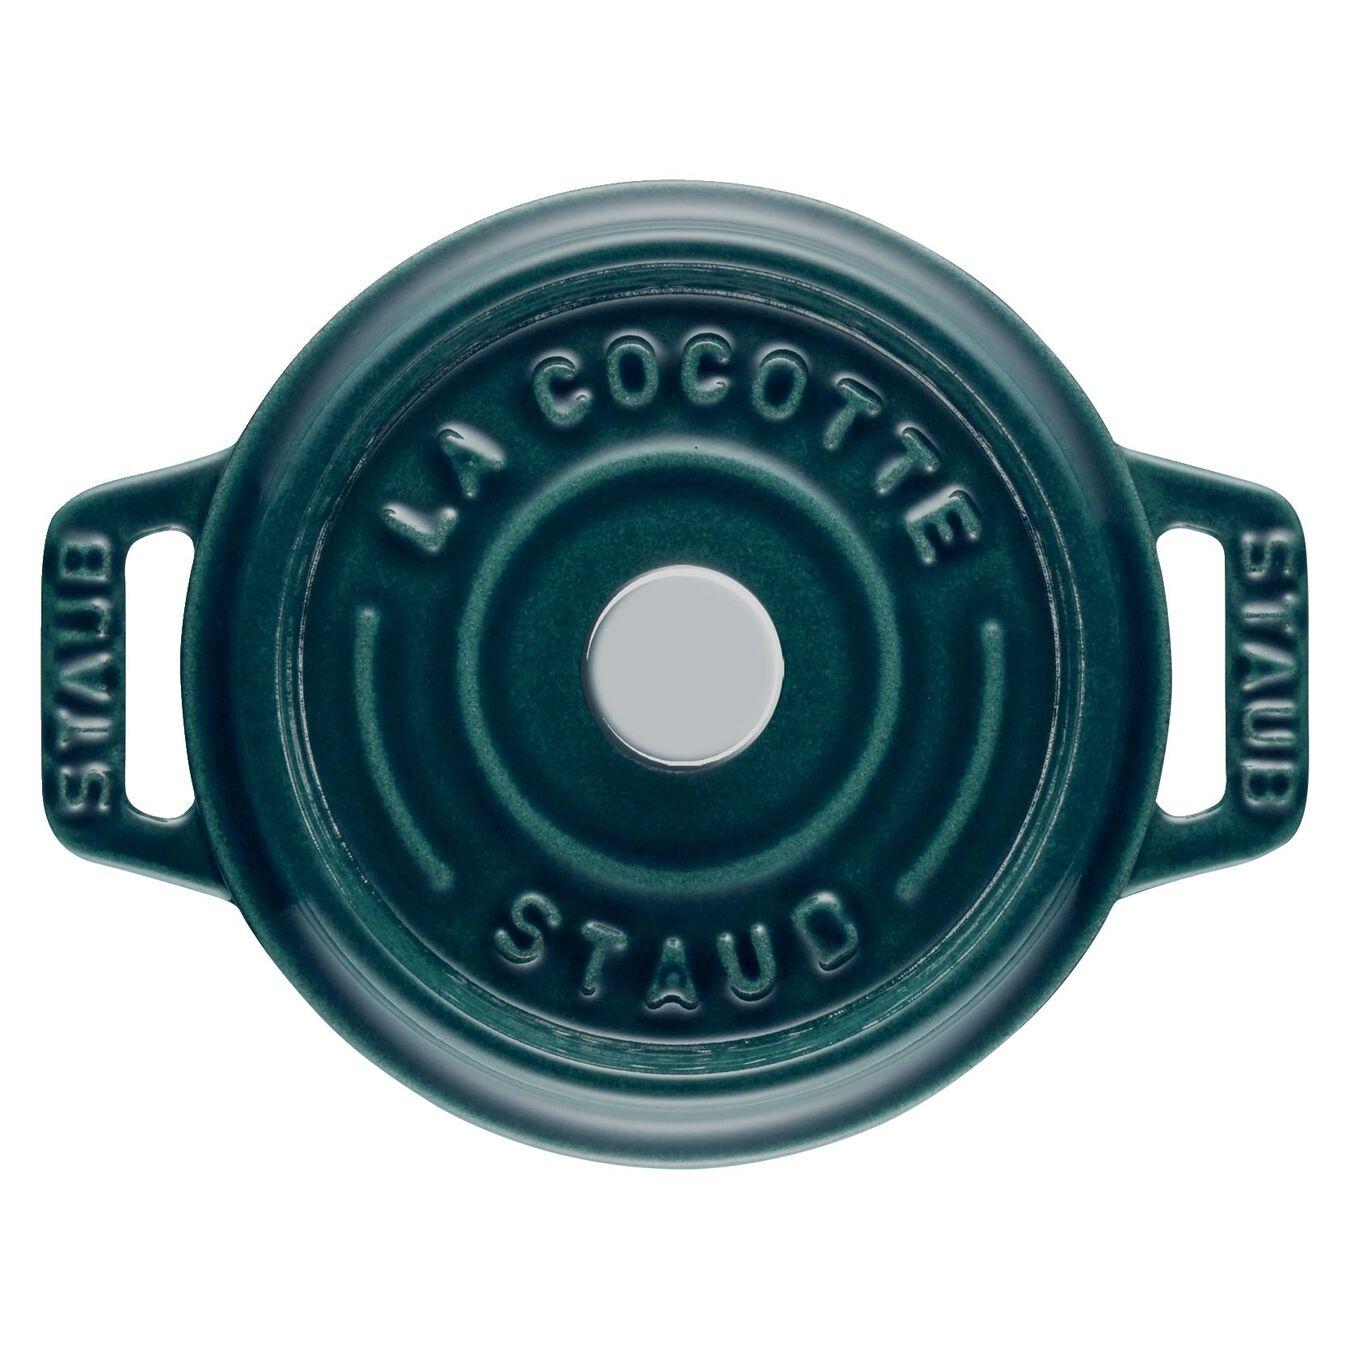 Mini Cocotte 10 cm, rund, La-Mer, Gusseisen,,large 3